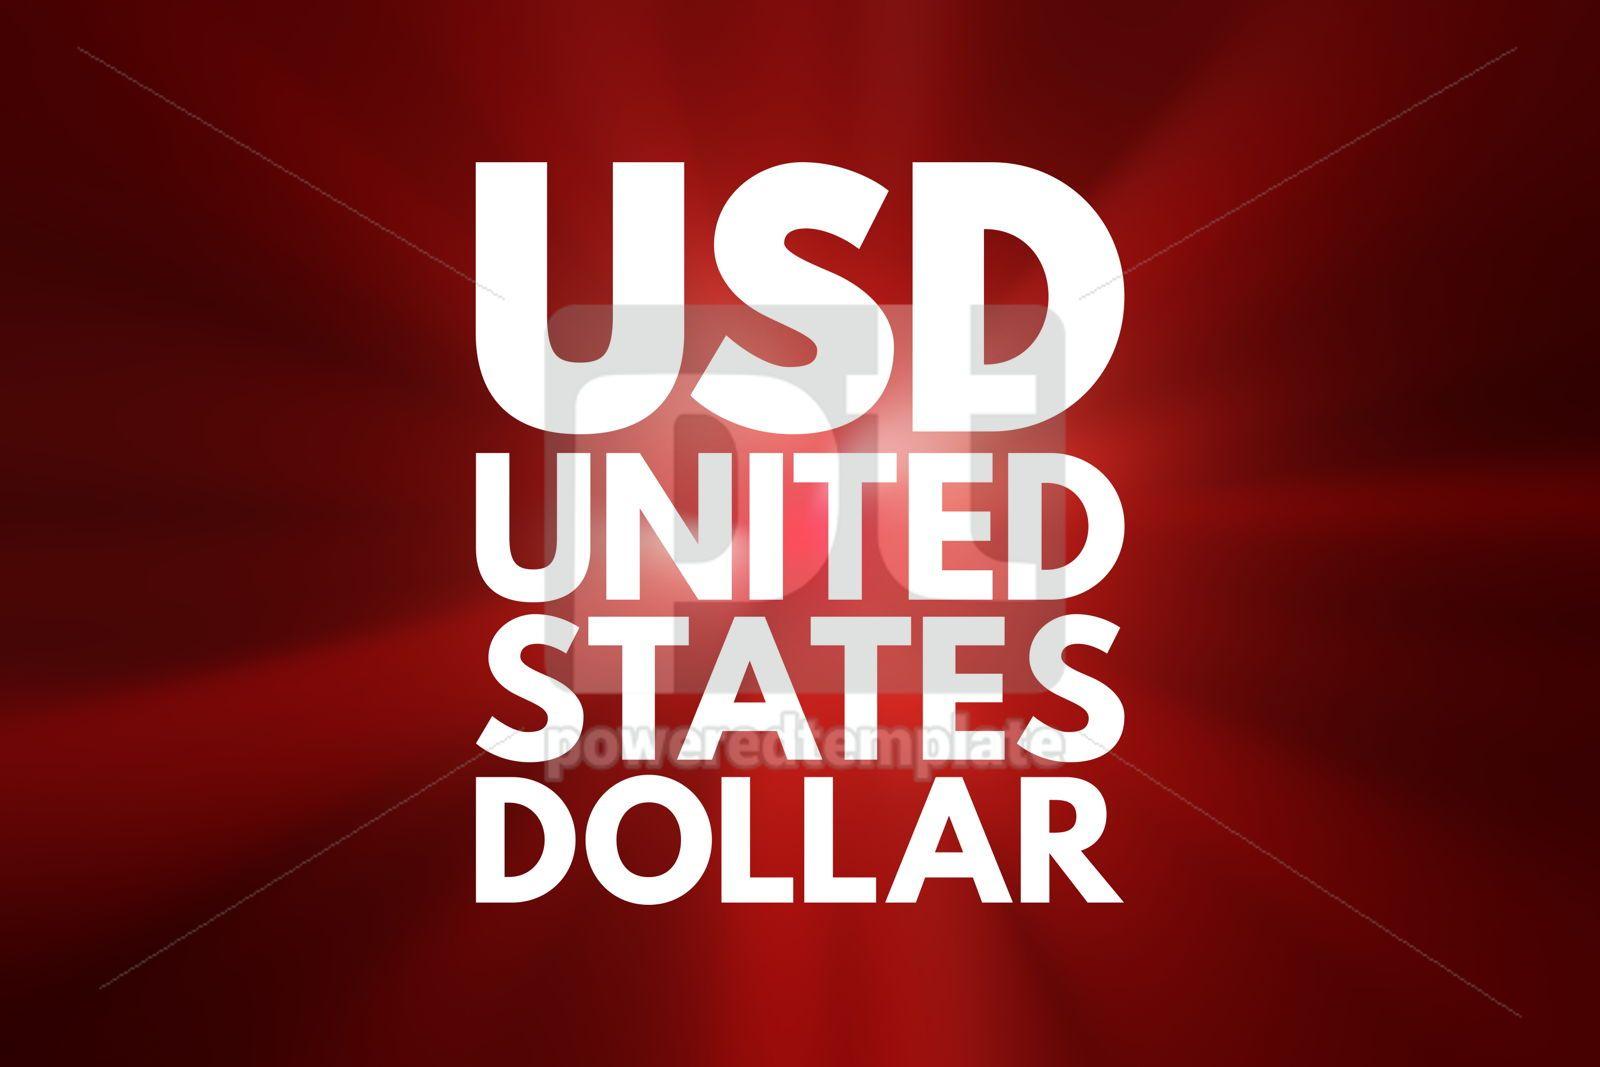 USD - United States Dollar acronym business concept background, 16161, Business — PoweredTemplate.com